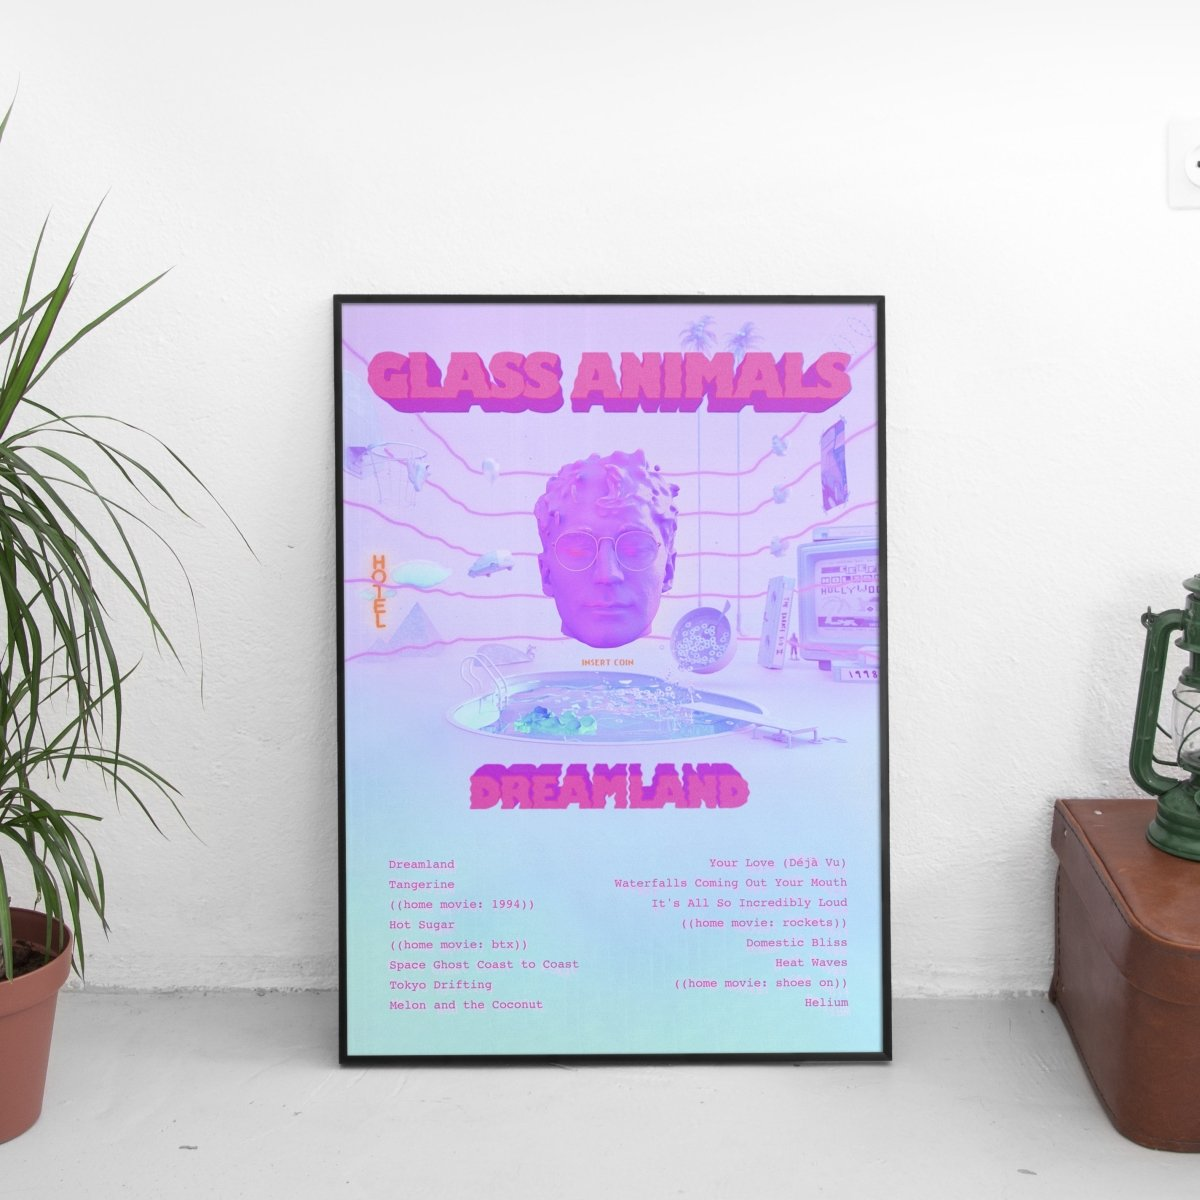 Glass Animals - Dreamland Tracklist Poster